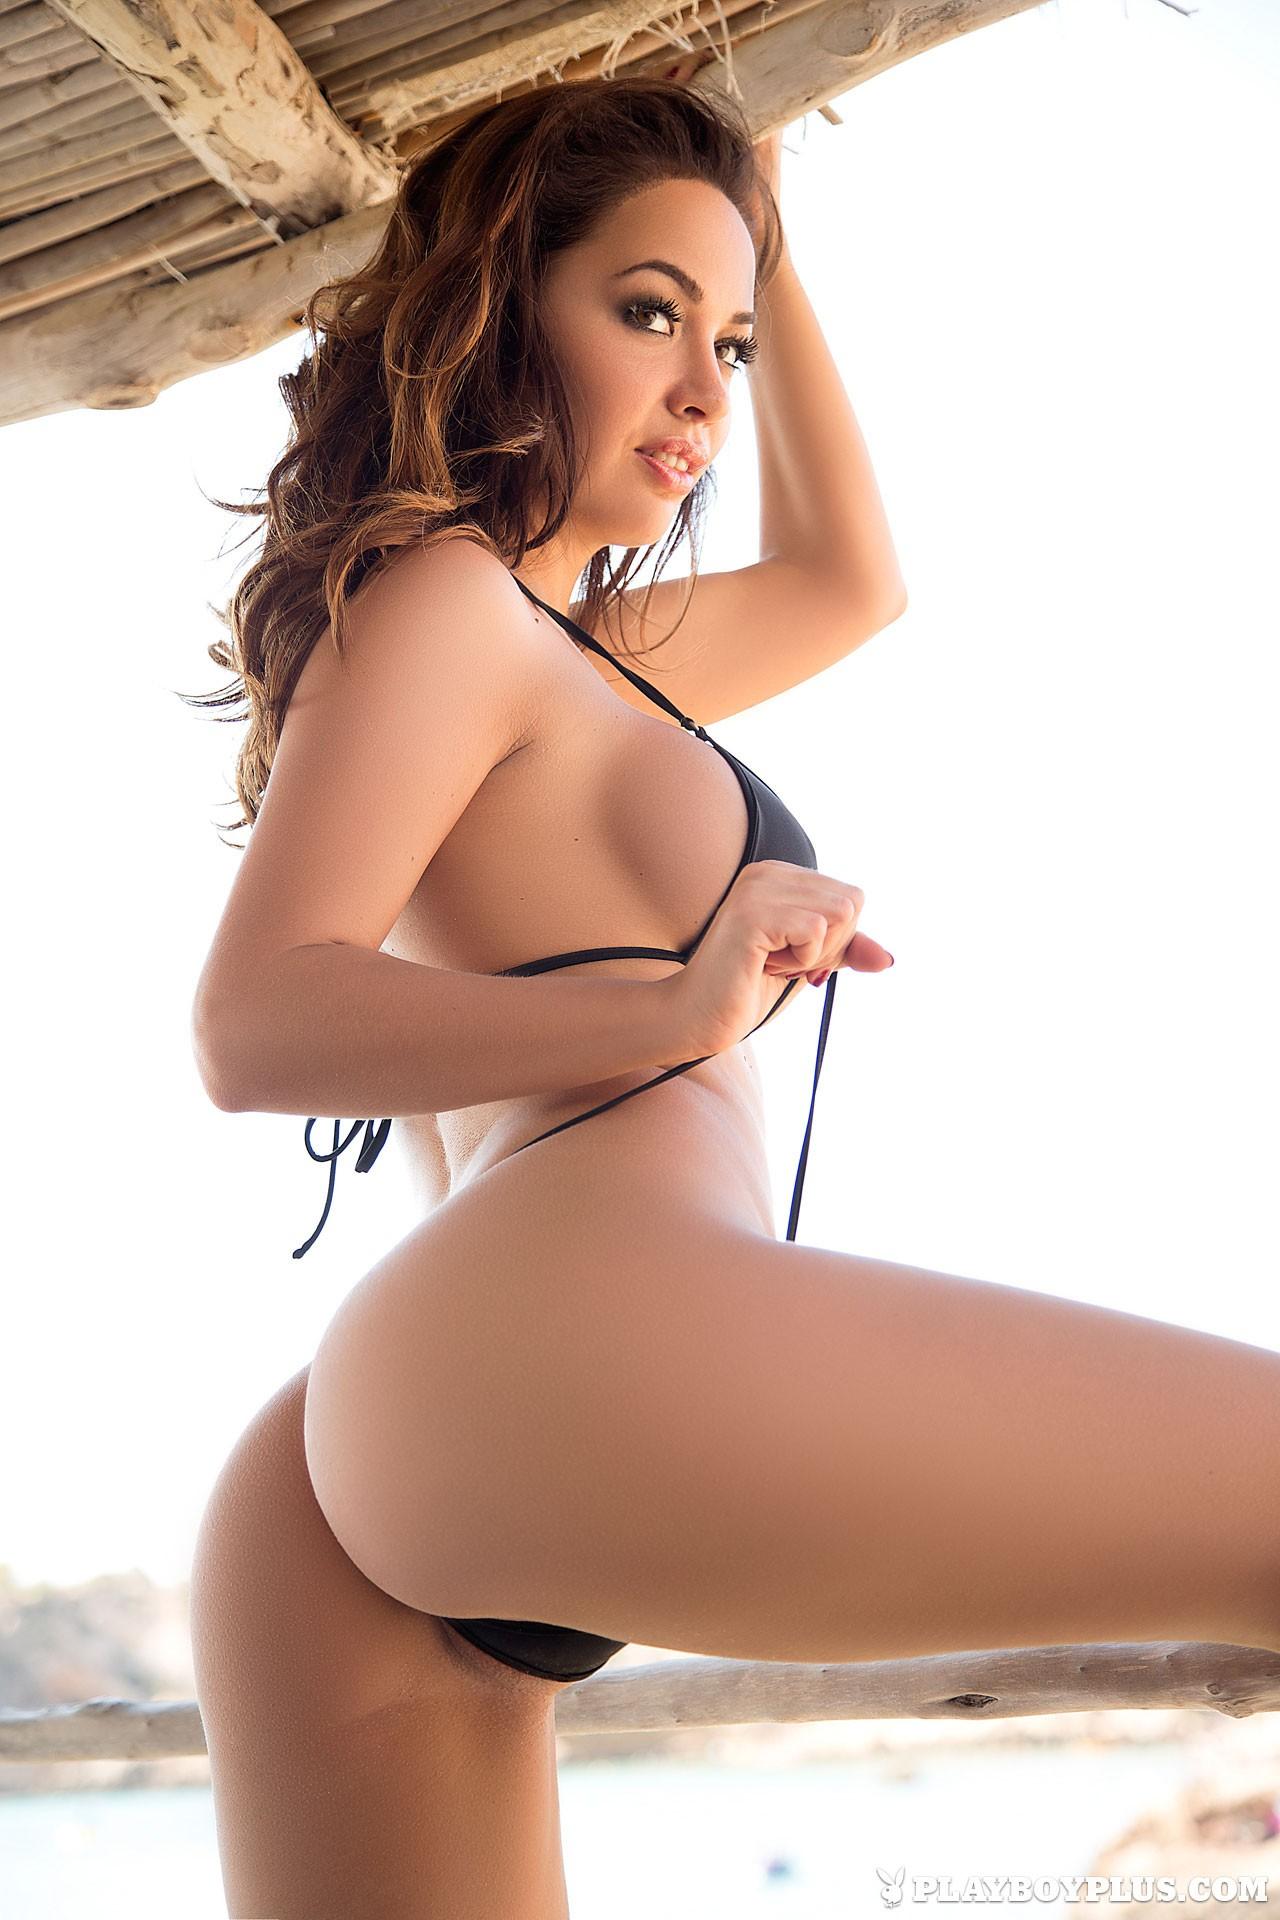 Bikini girl hot hot hot, leg sex tube videos